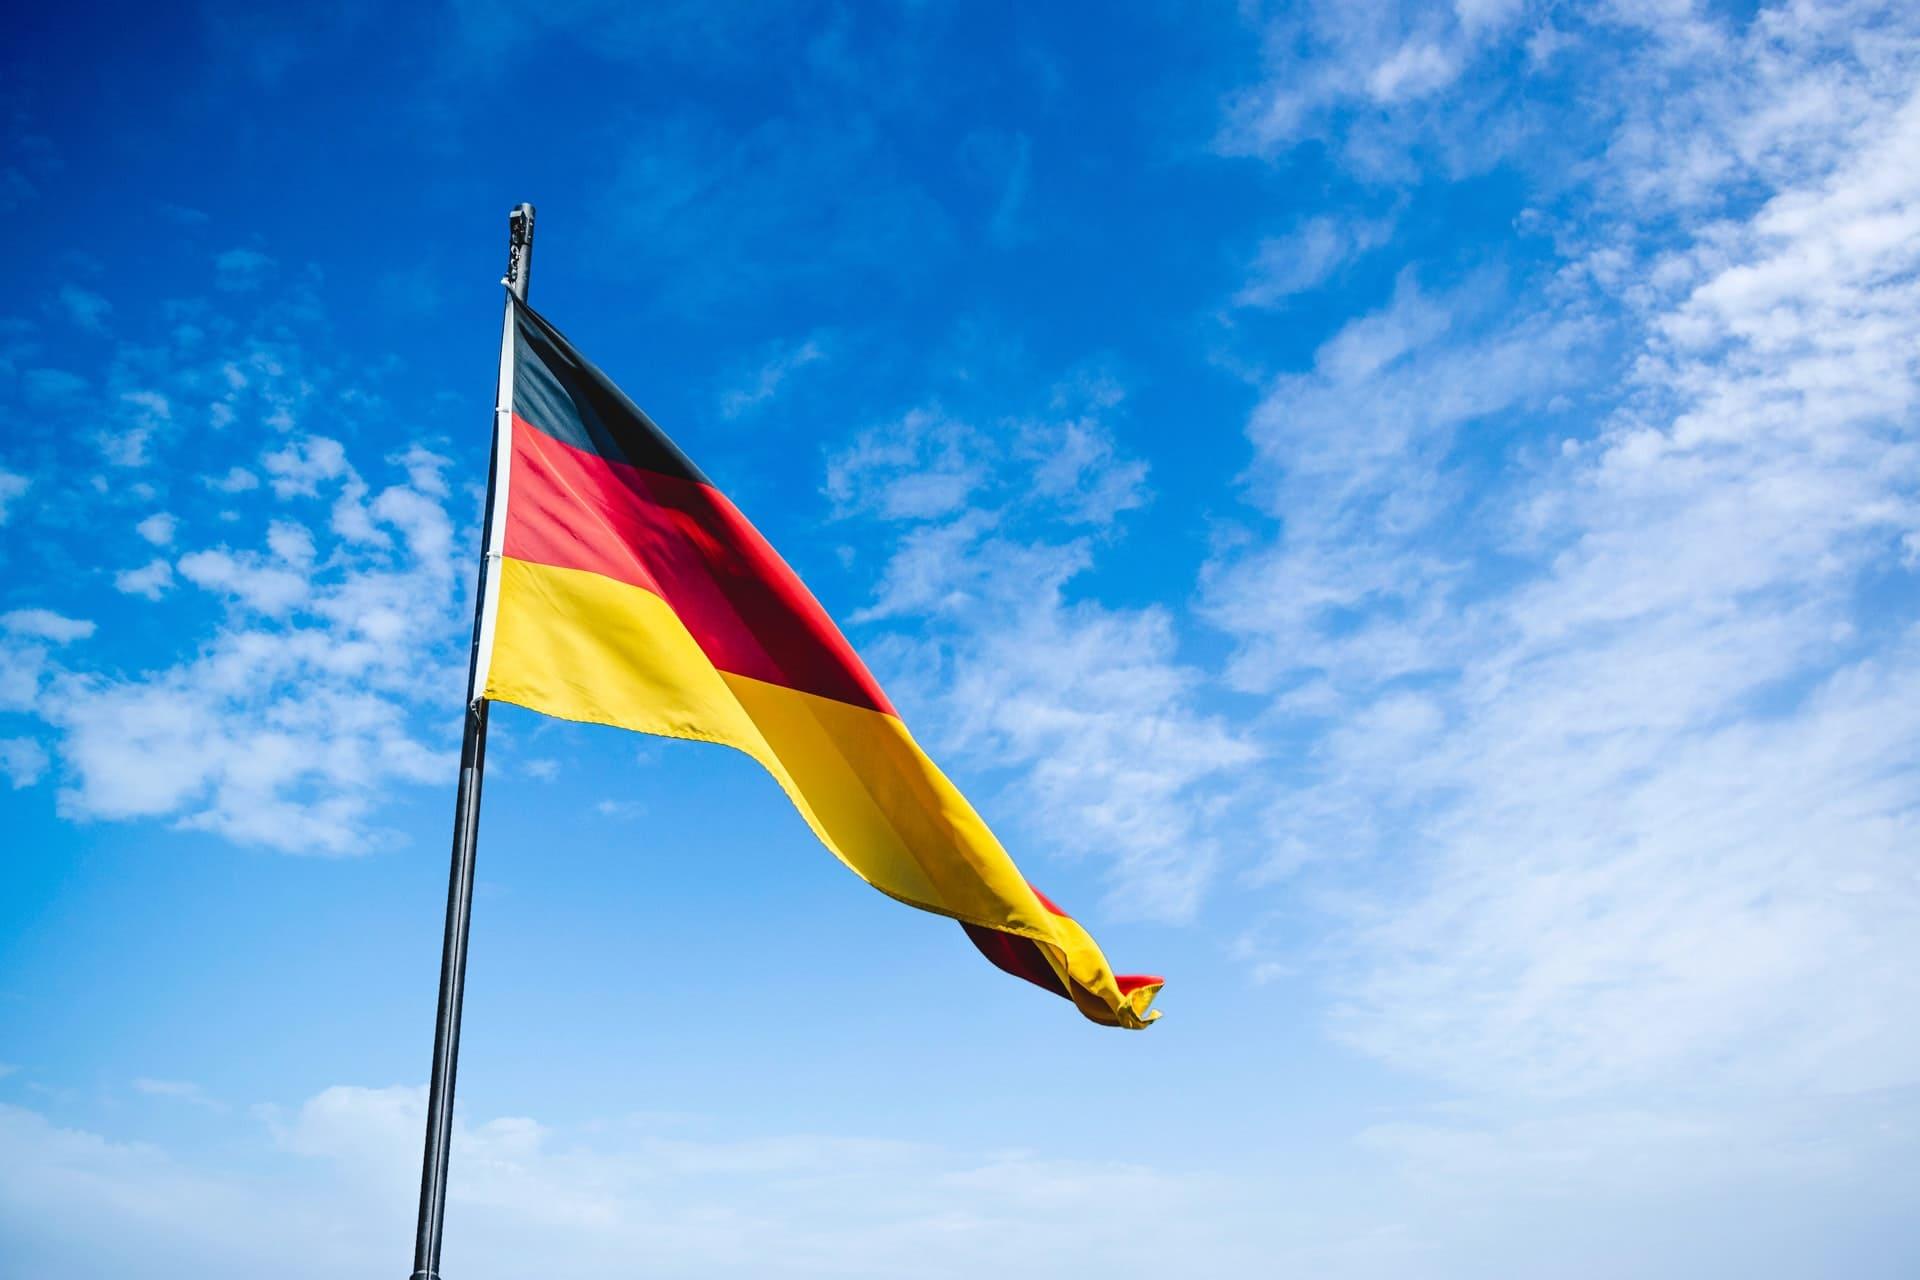 Alemania Unsplash